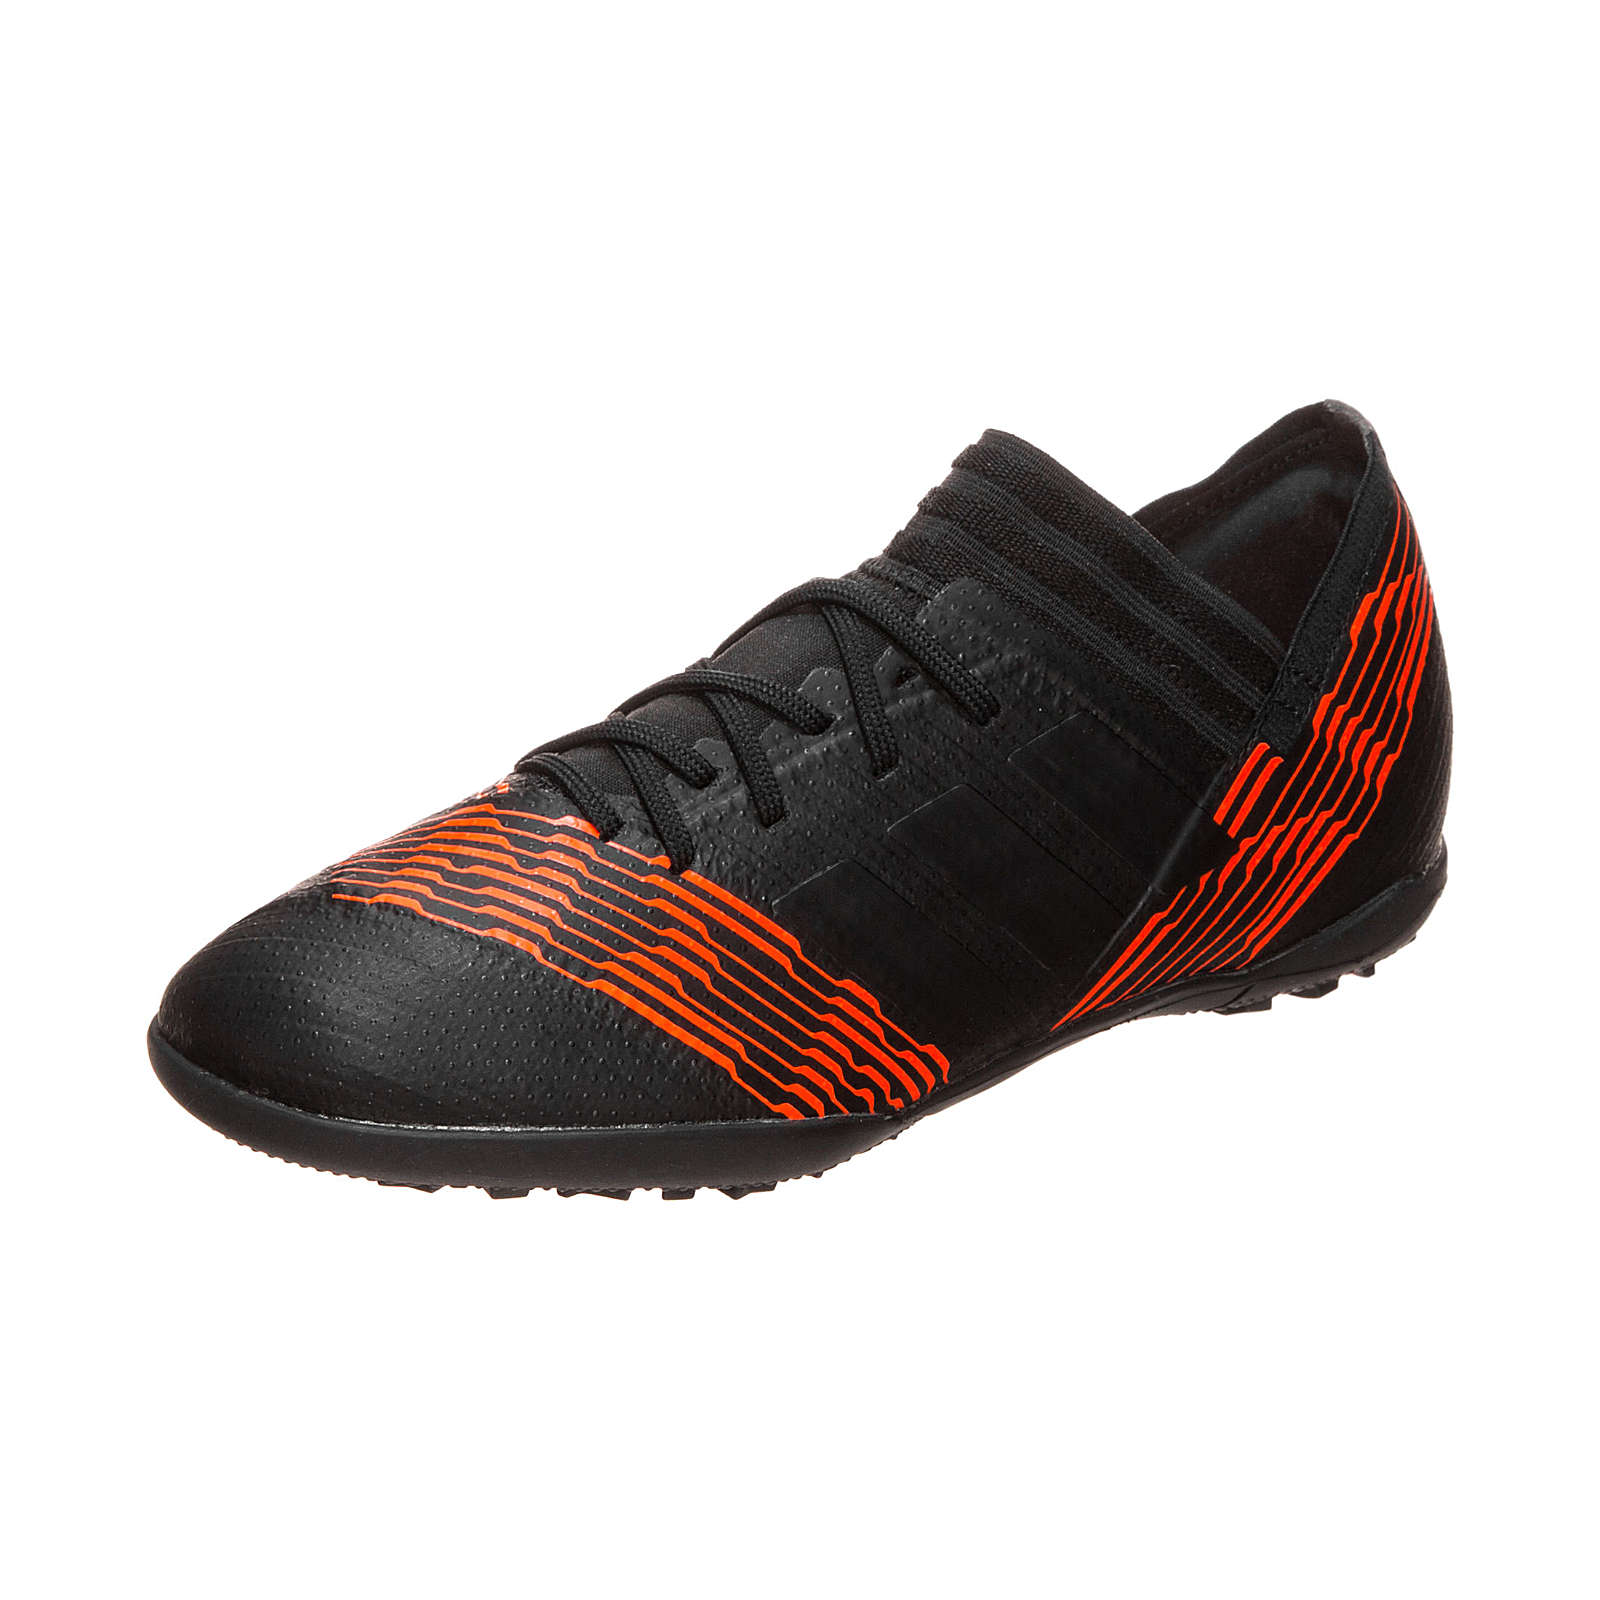 adidas Performance Kinder Fußballschuhe Nemeziz 17.3 schwarz-kombi Gr. 38 2/3